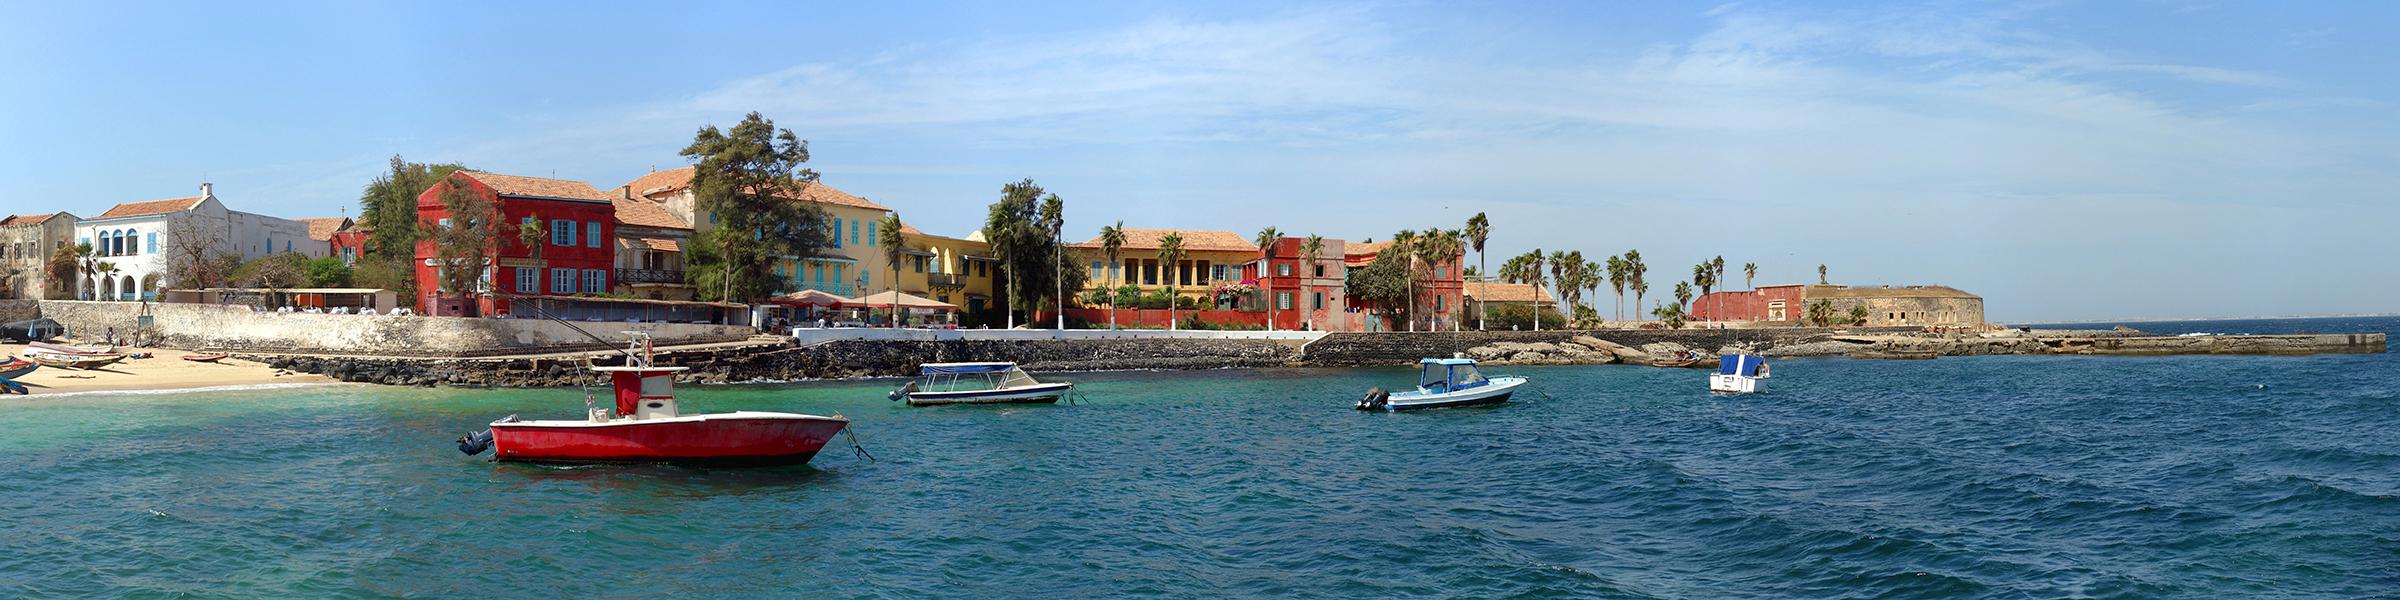 Senegal Dakar Gorée Island